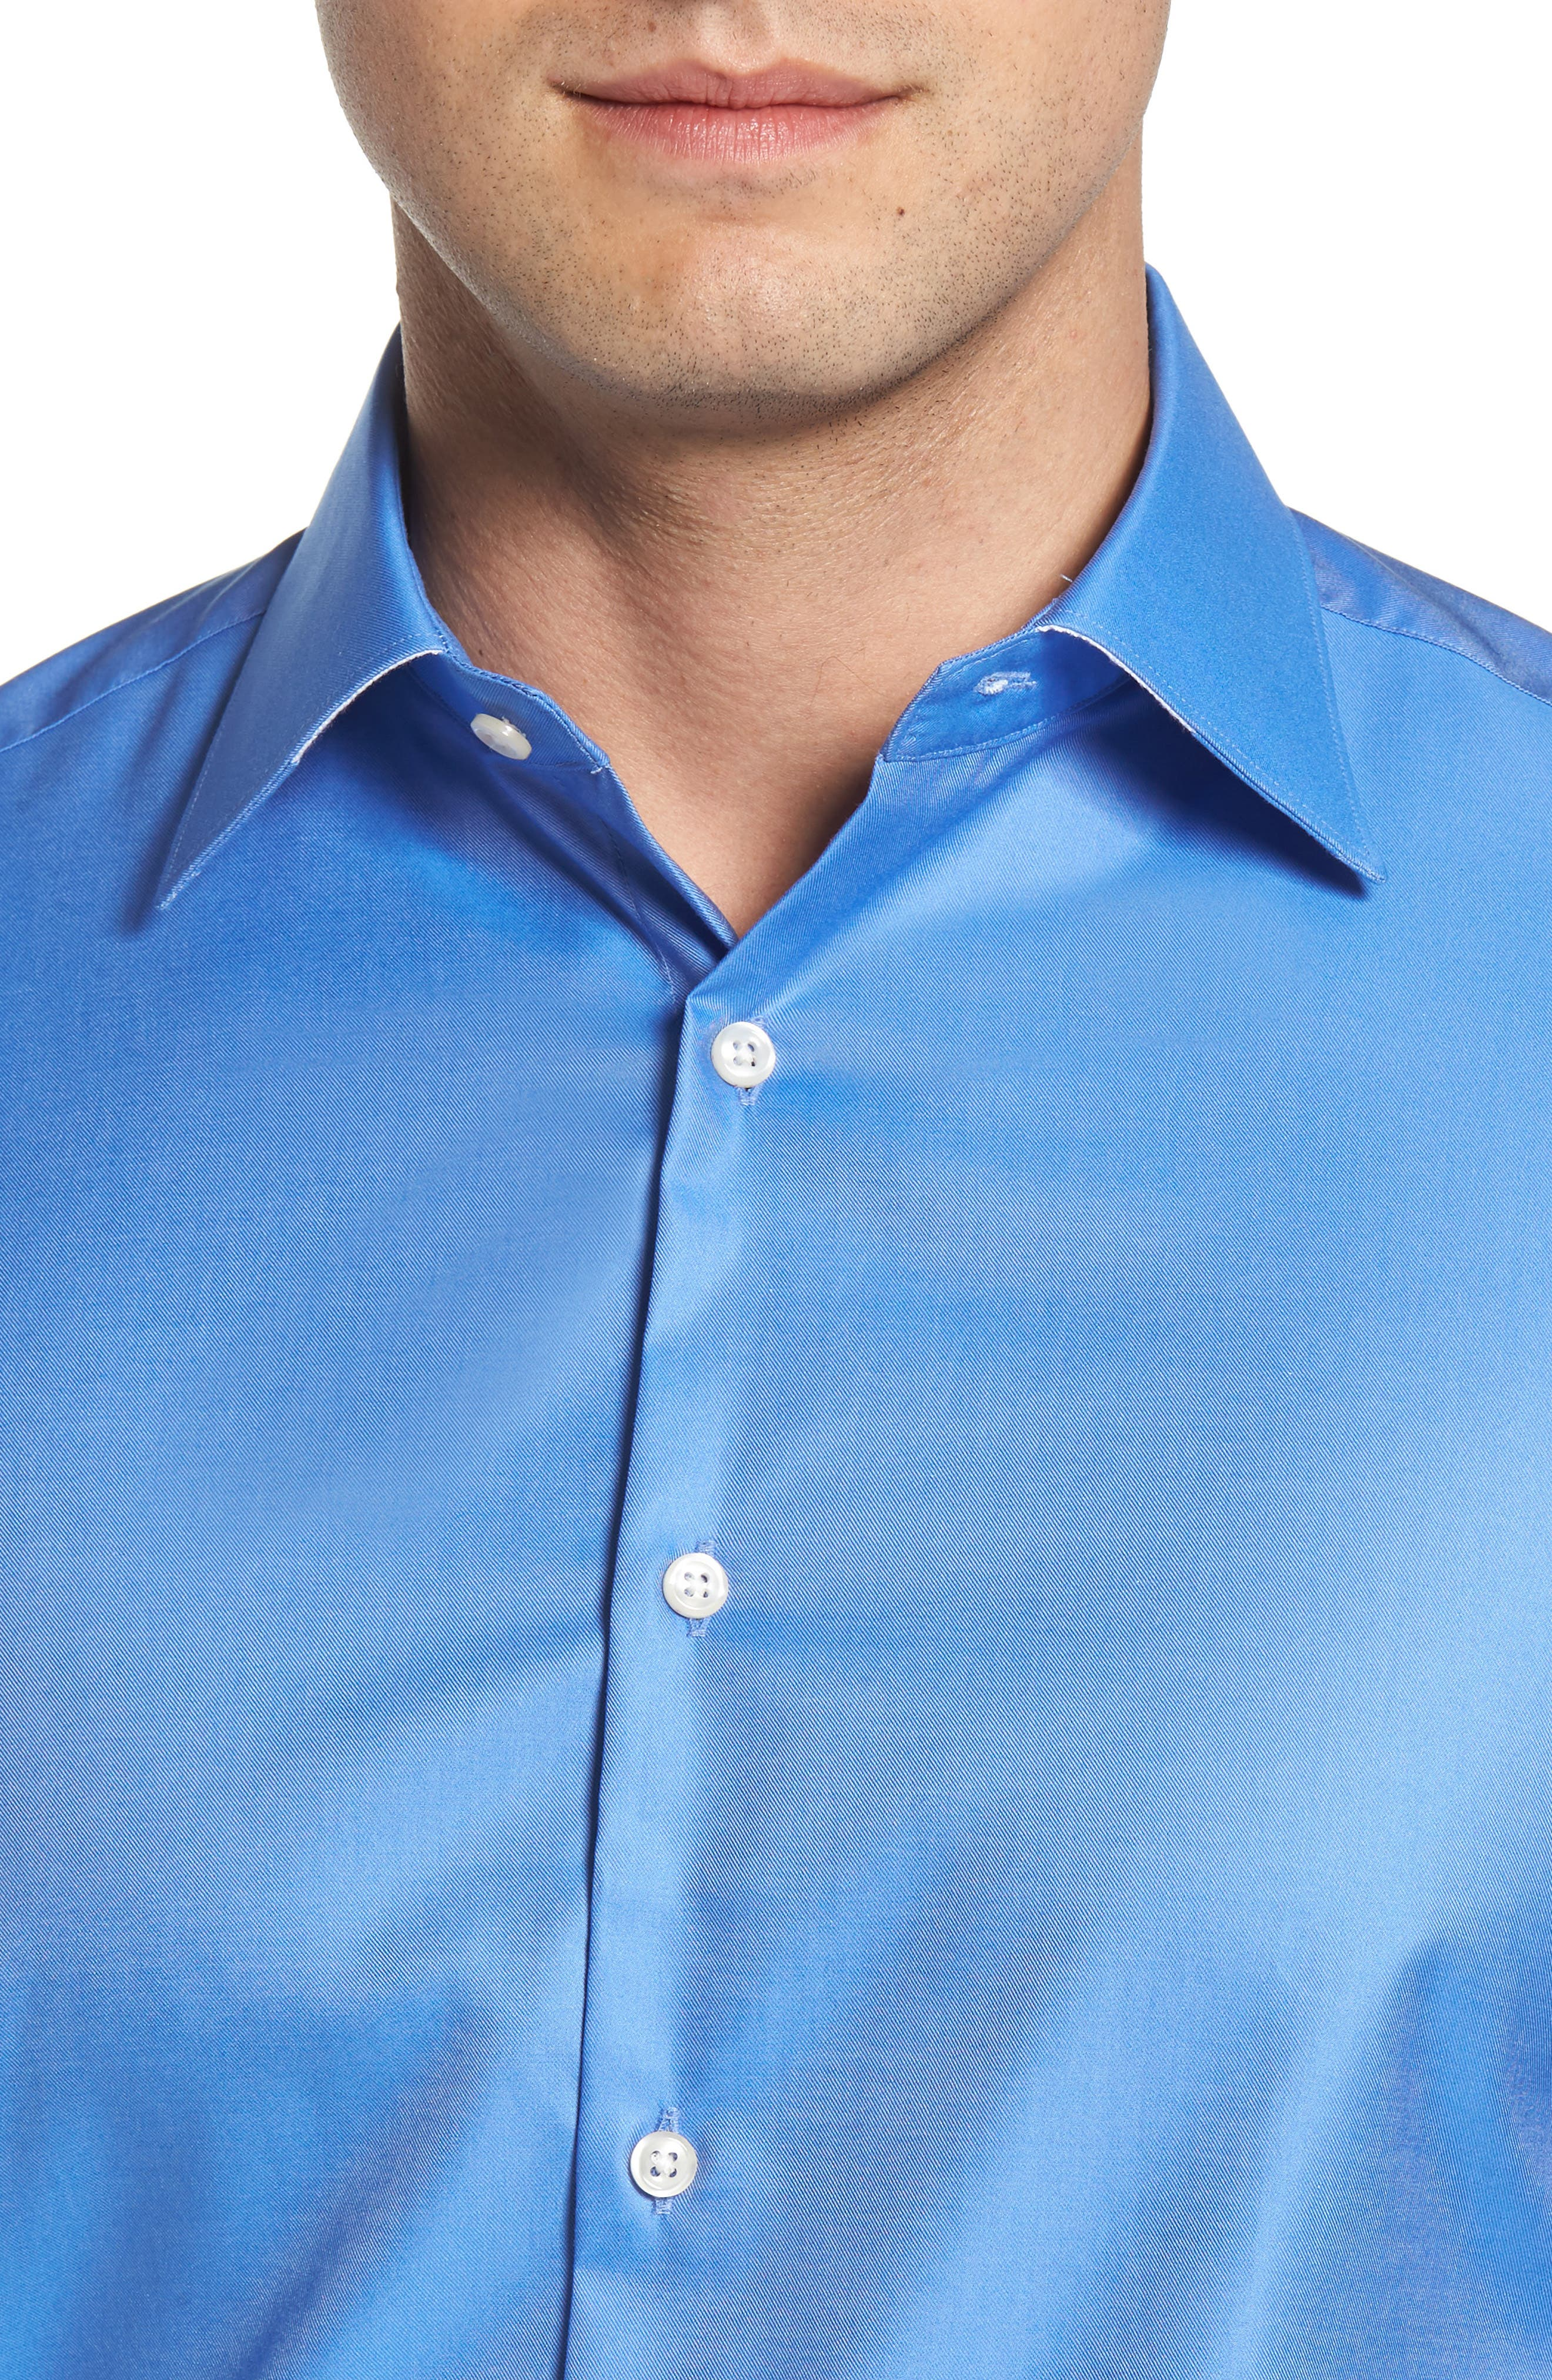 Regular Fit Solid Dress Shirt,                             Alternate thumbnail 2, color,                             DARK BLUE